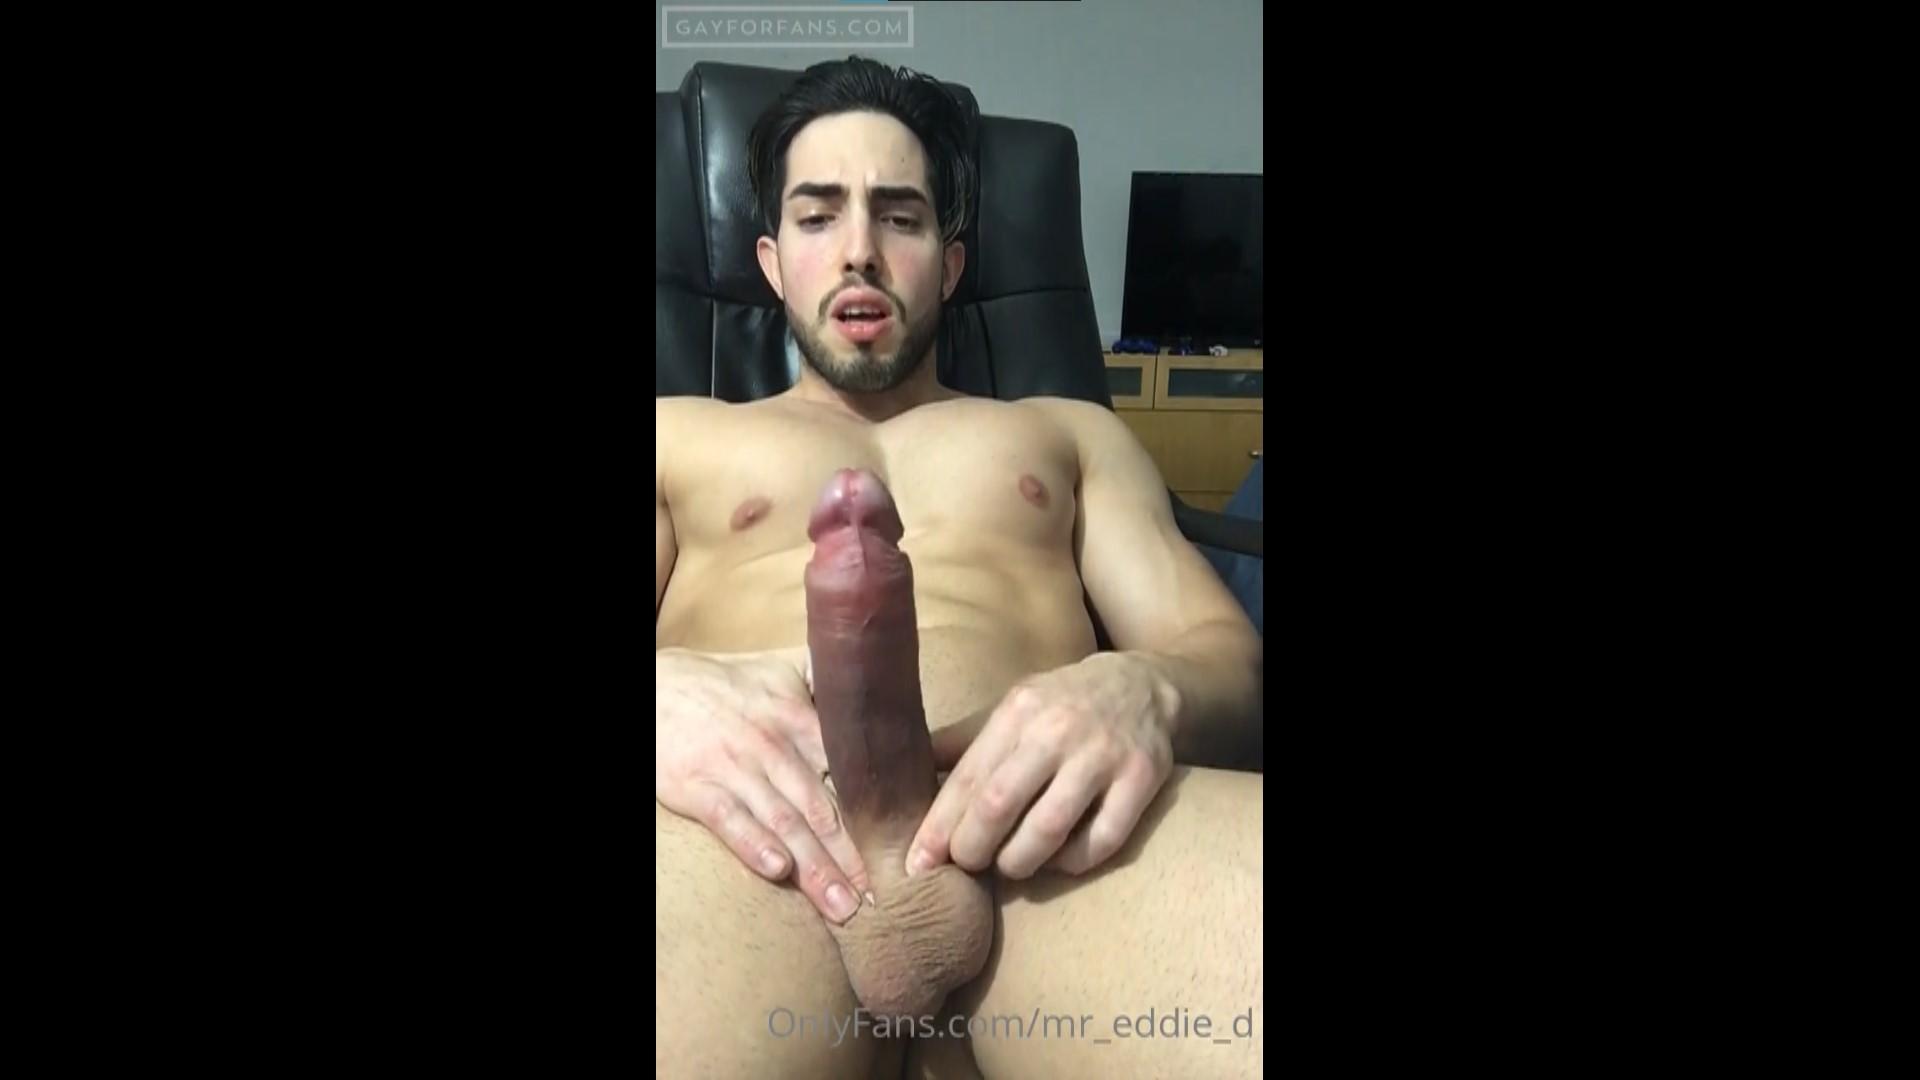 Jerking off and cumming hands free – Mr_eddie_d